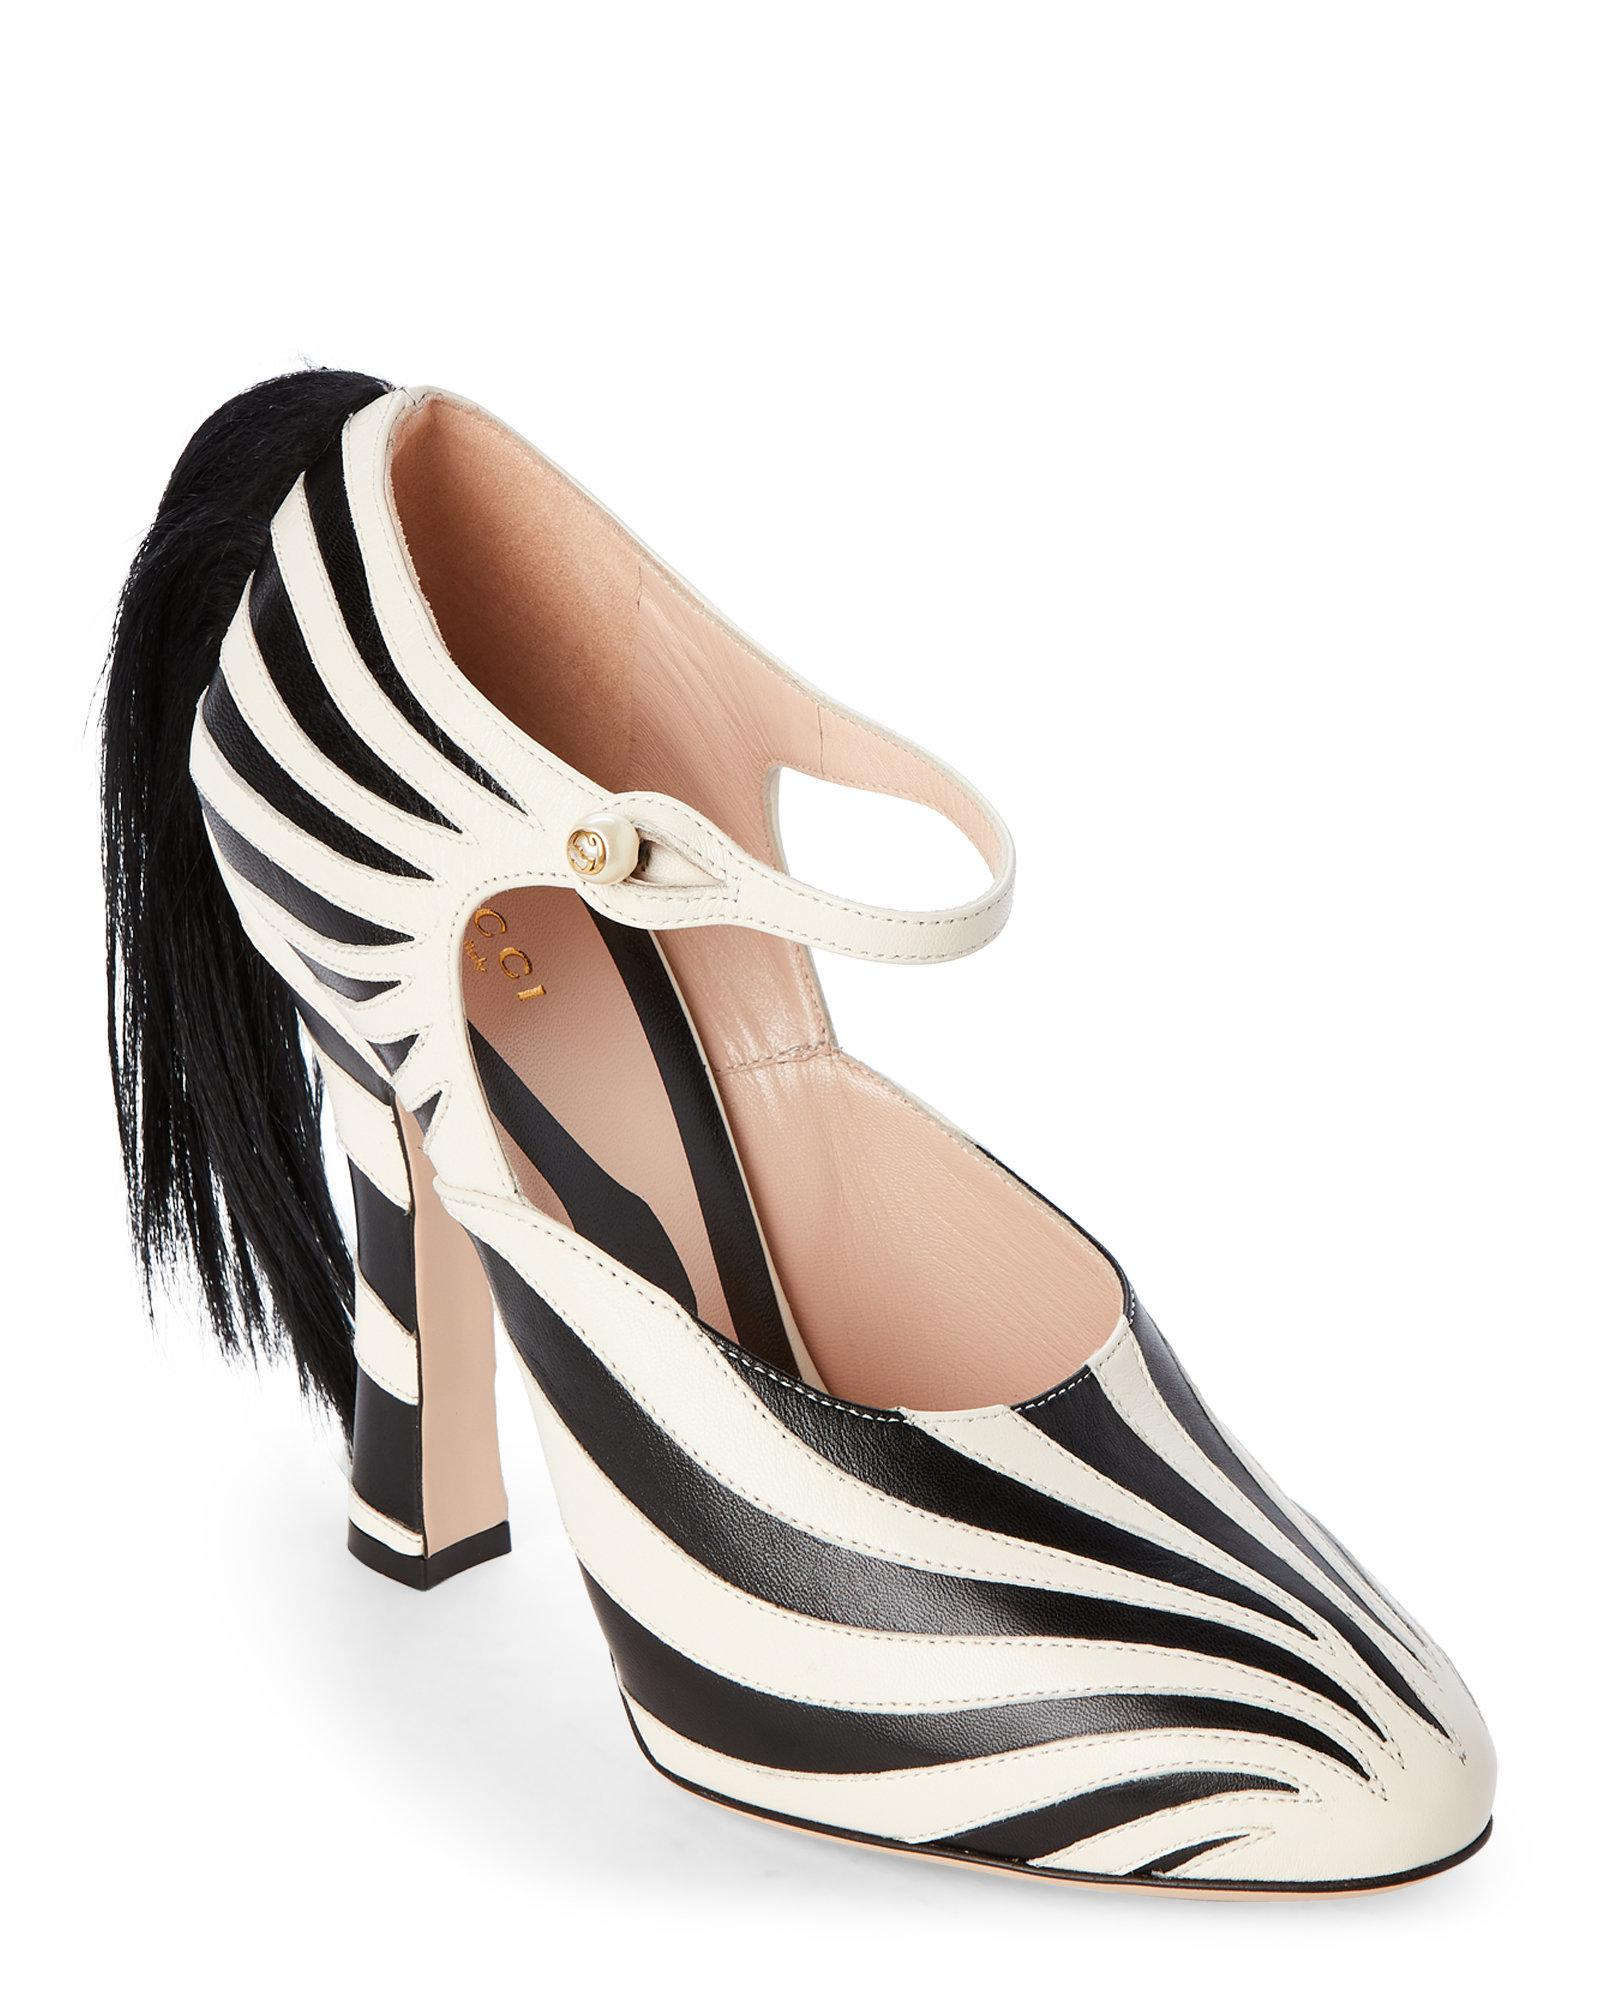 1d19f4395 Gucci Black & White Lesley Zebra Real Fur Mary Jane Pumps in Black ...